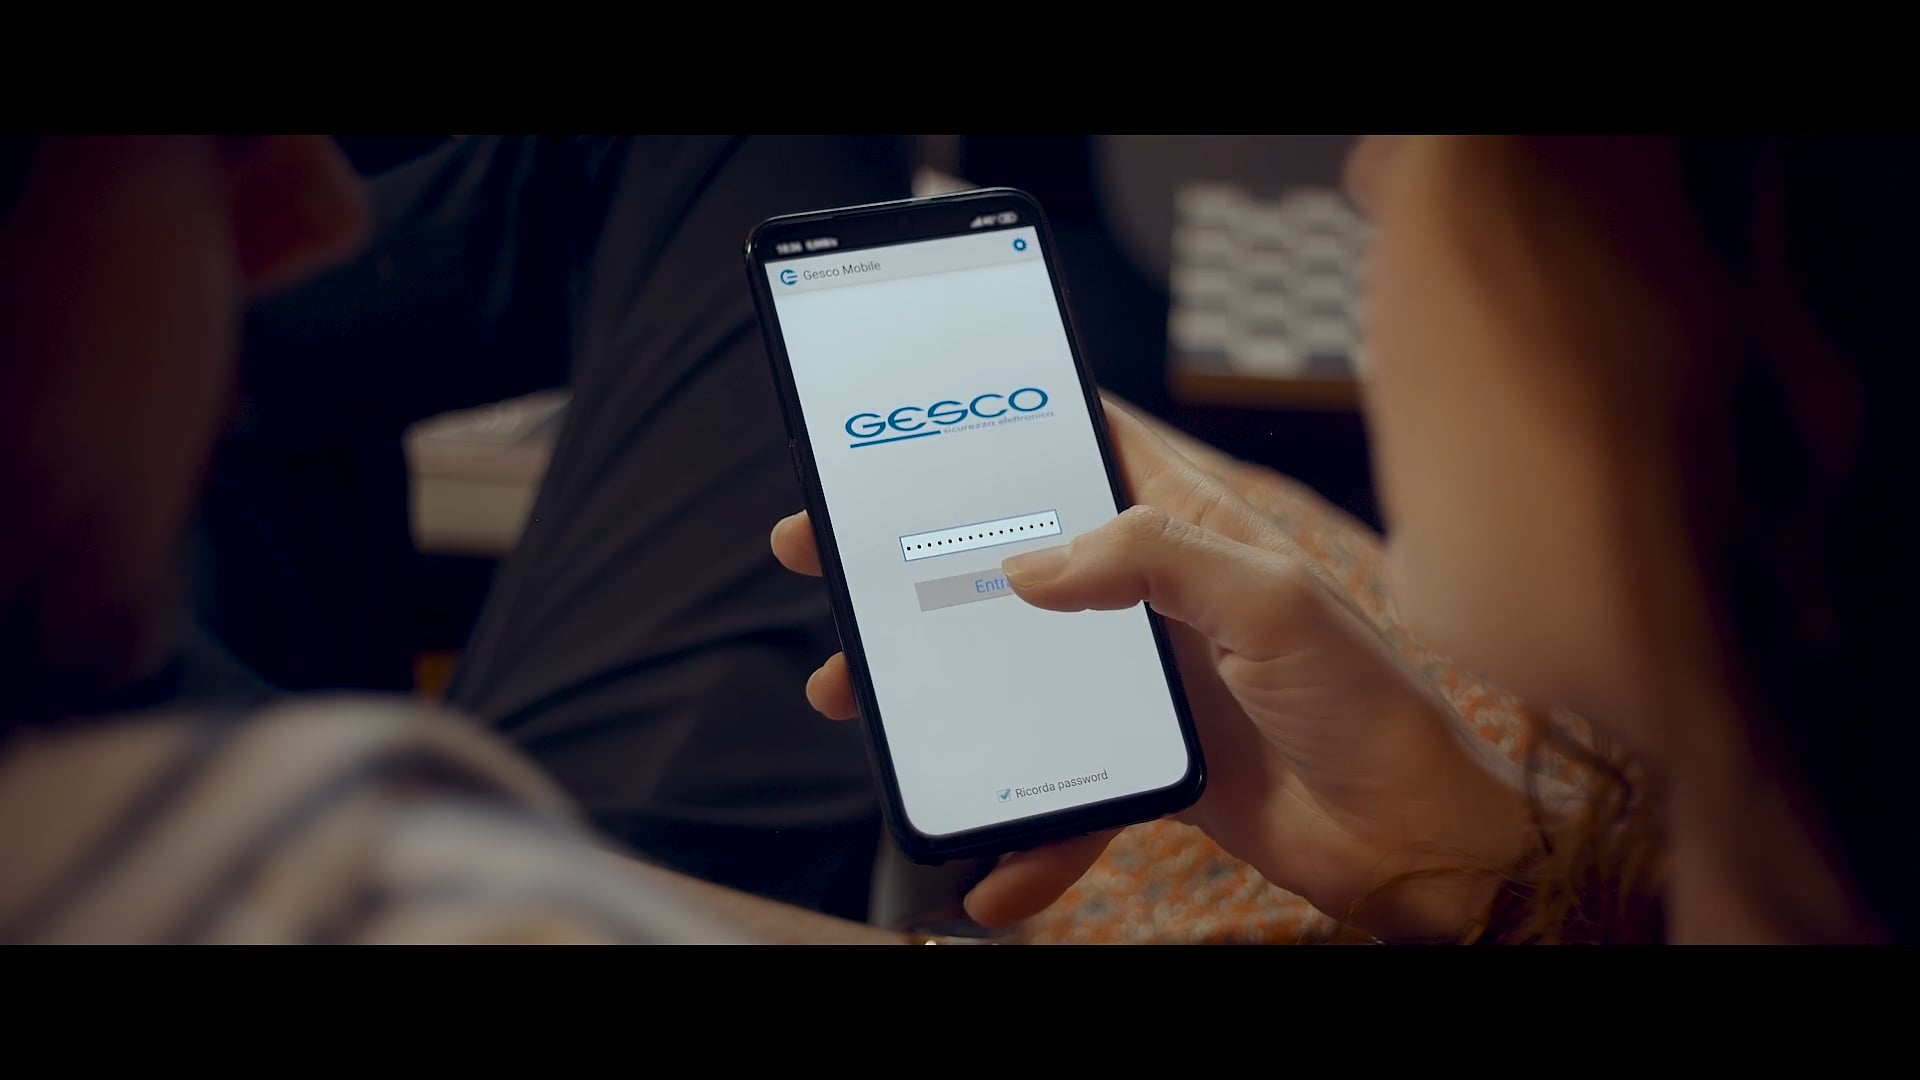 GESCO - Antifurti Corporate